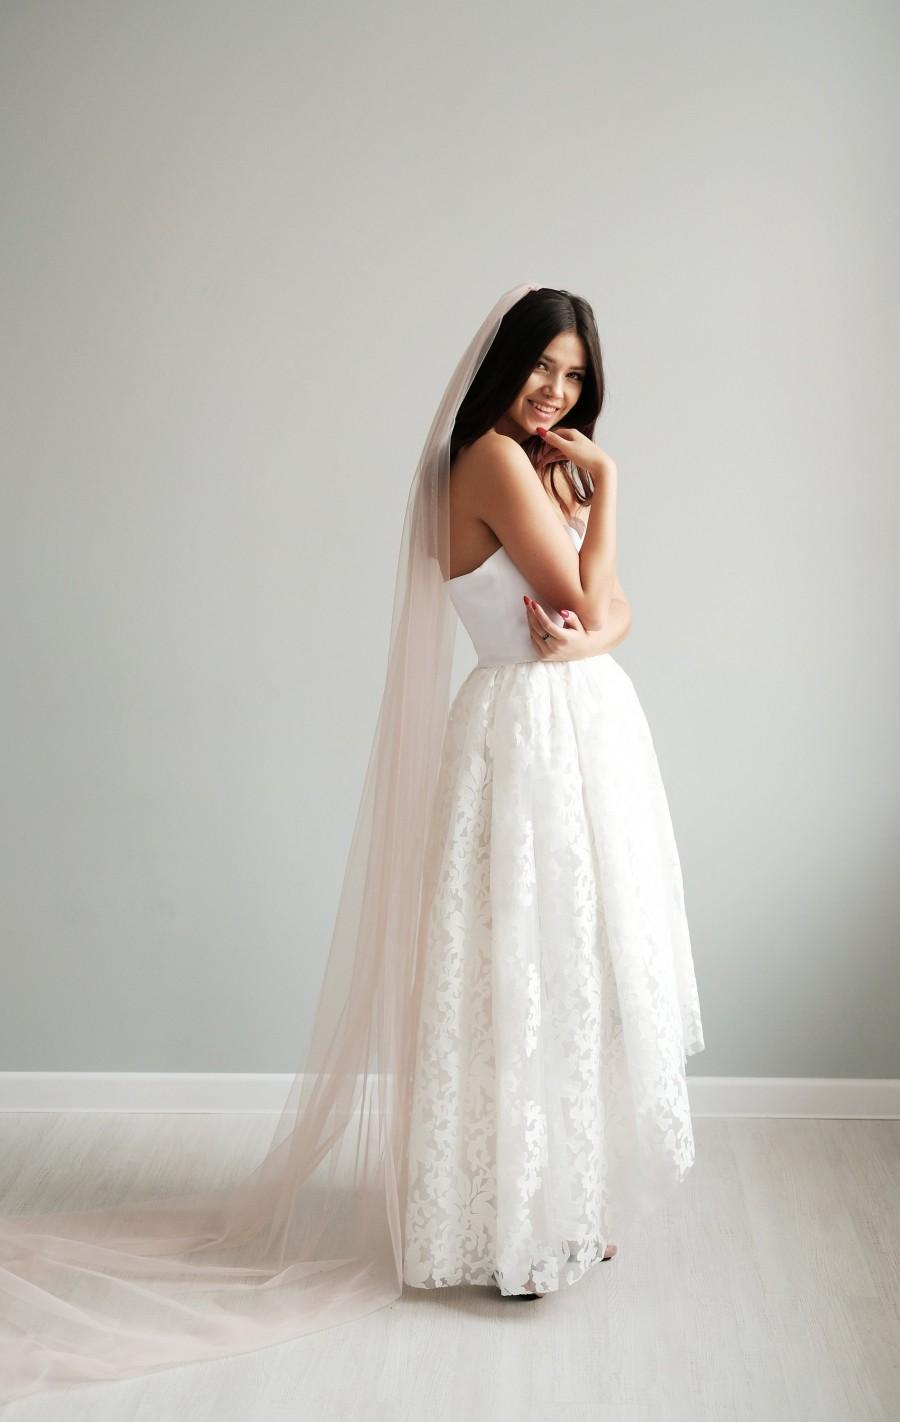 Mariage - Blush wedding veil, Bridal veil, Pink veil, Wedding veil, Veil wedding, Veil bridal, Champagne veil